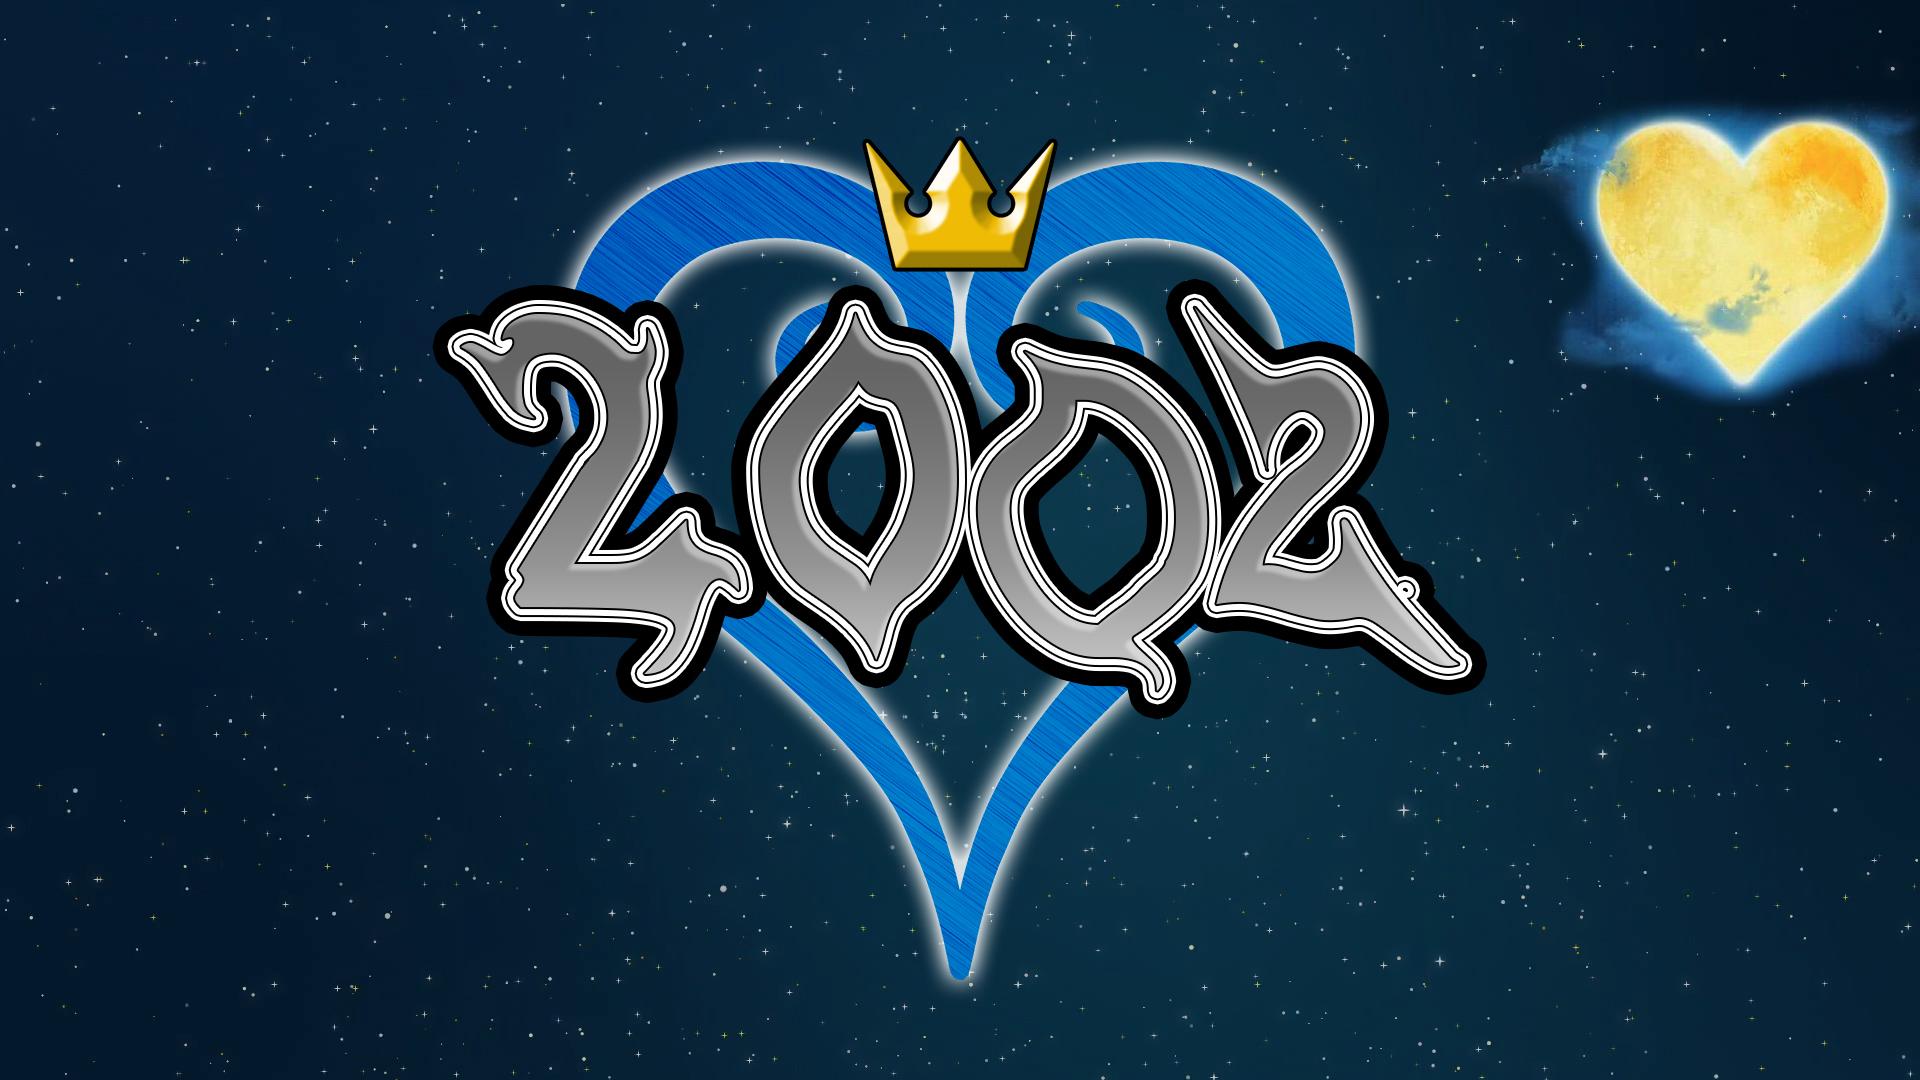 2002 Kingdom Hearts.jpg